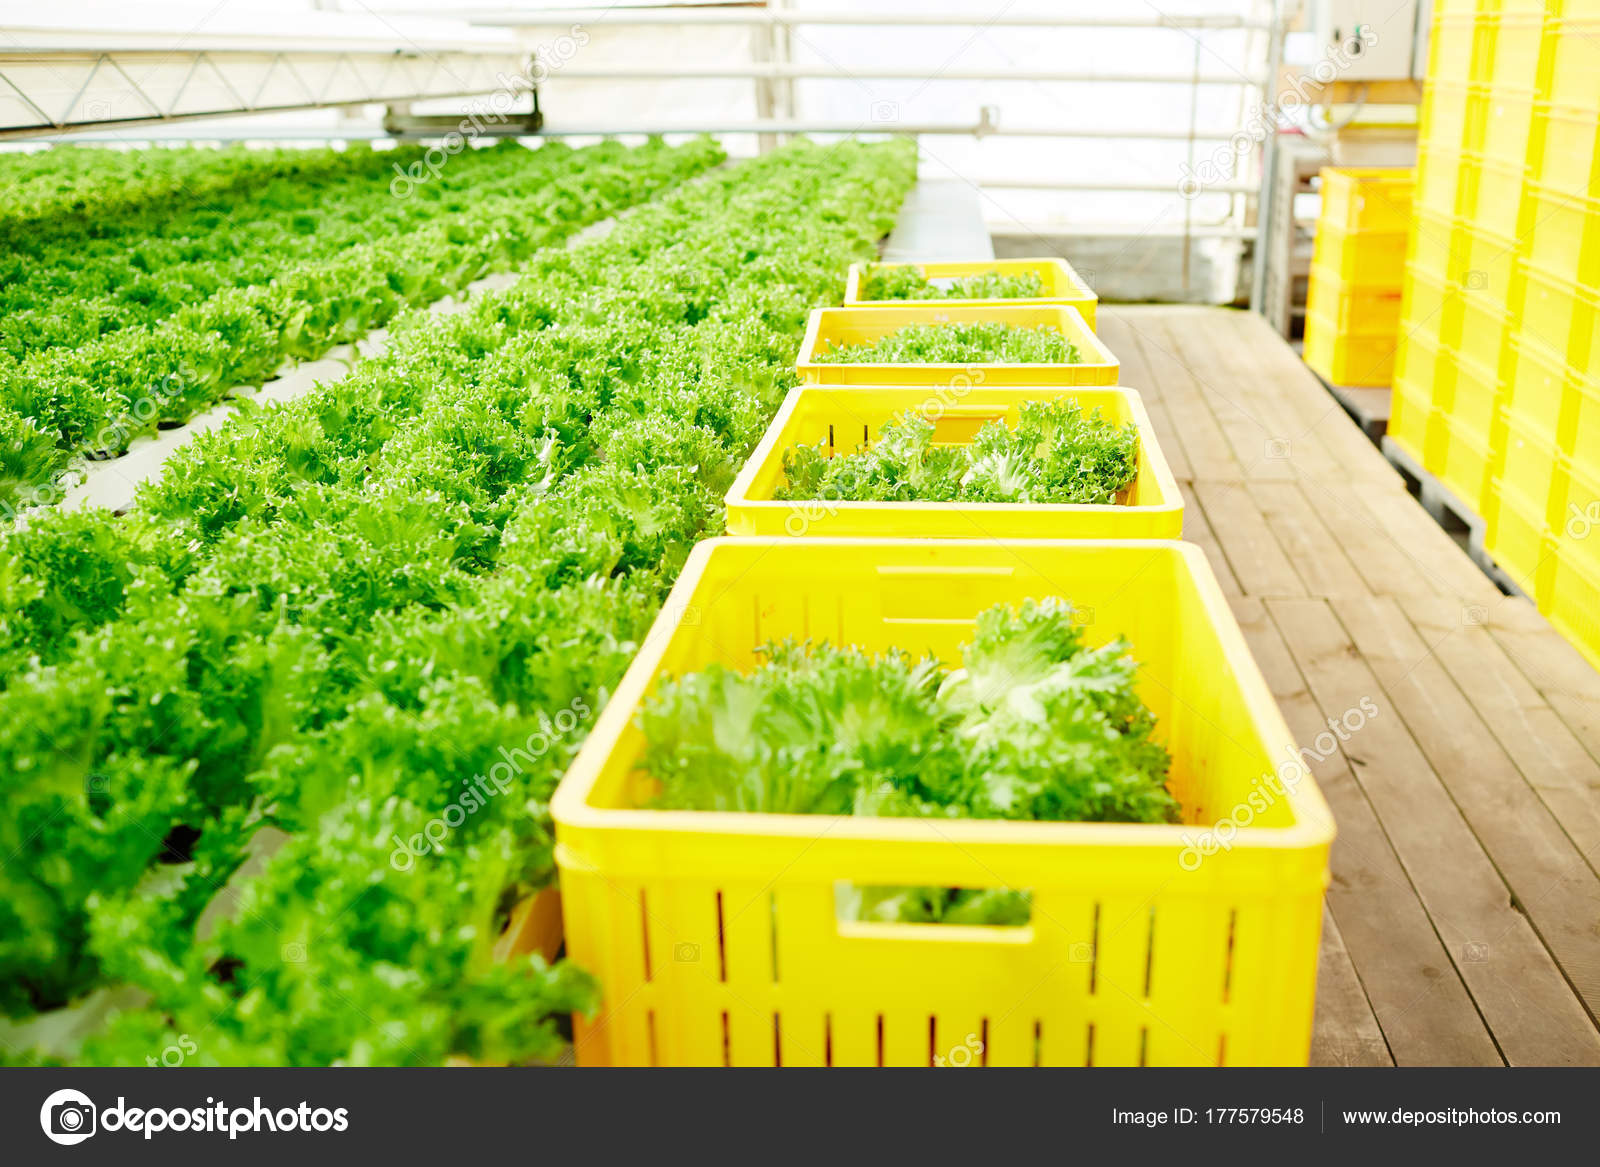 Bio Food Growing Greenhouse Some Plastic Farm Baskets Fresh Lettuce Stock Photo